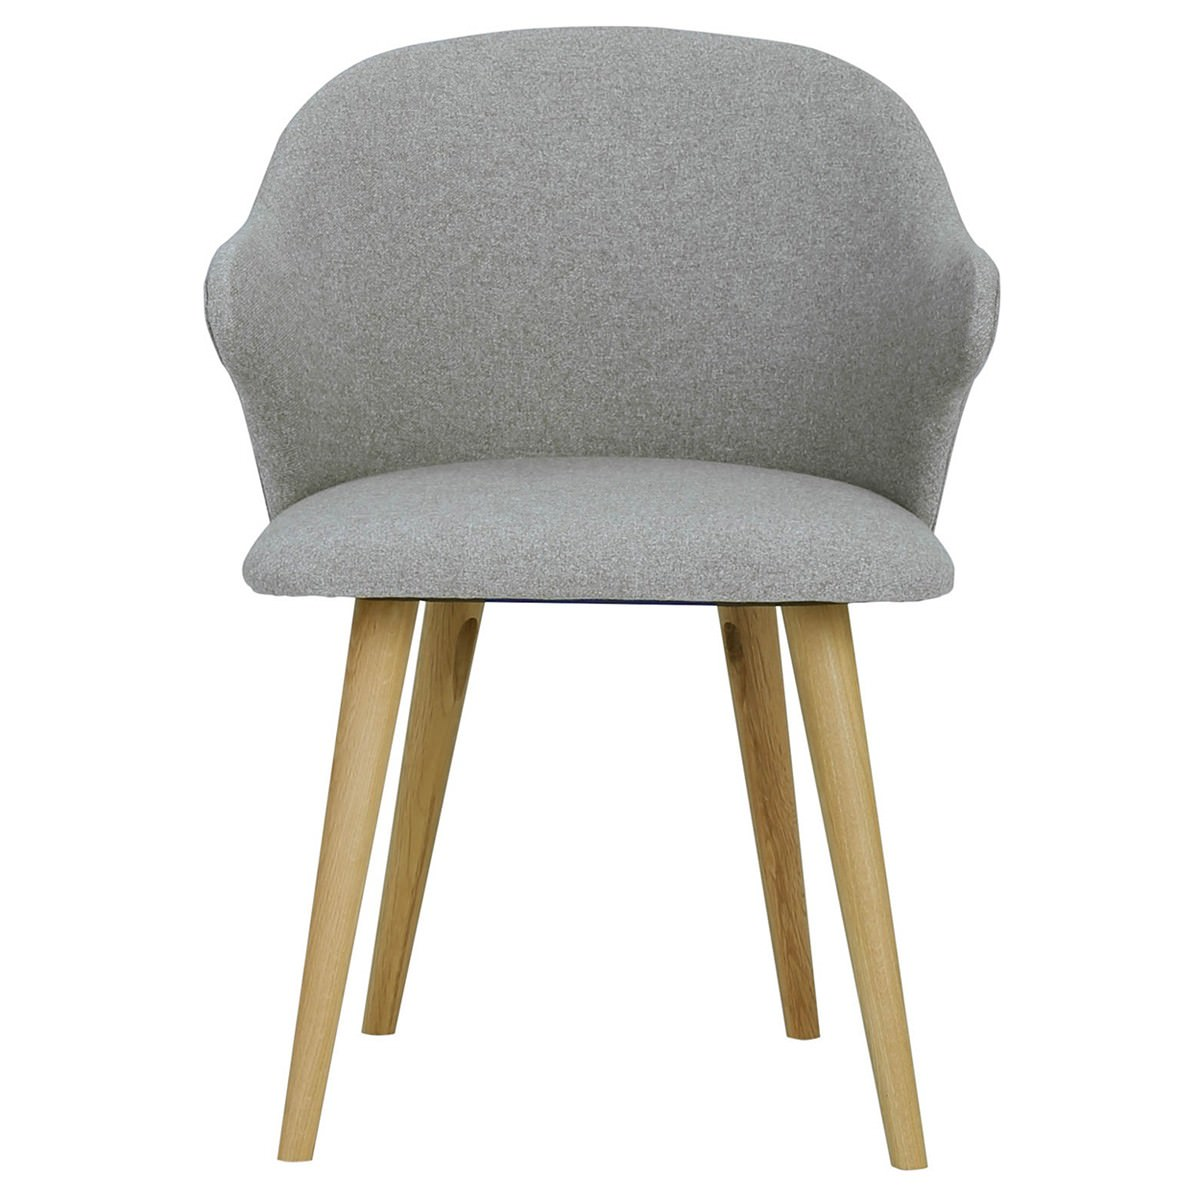 Ceyla Fabric Dining Chair, Light Grey / Oak